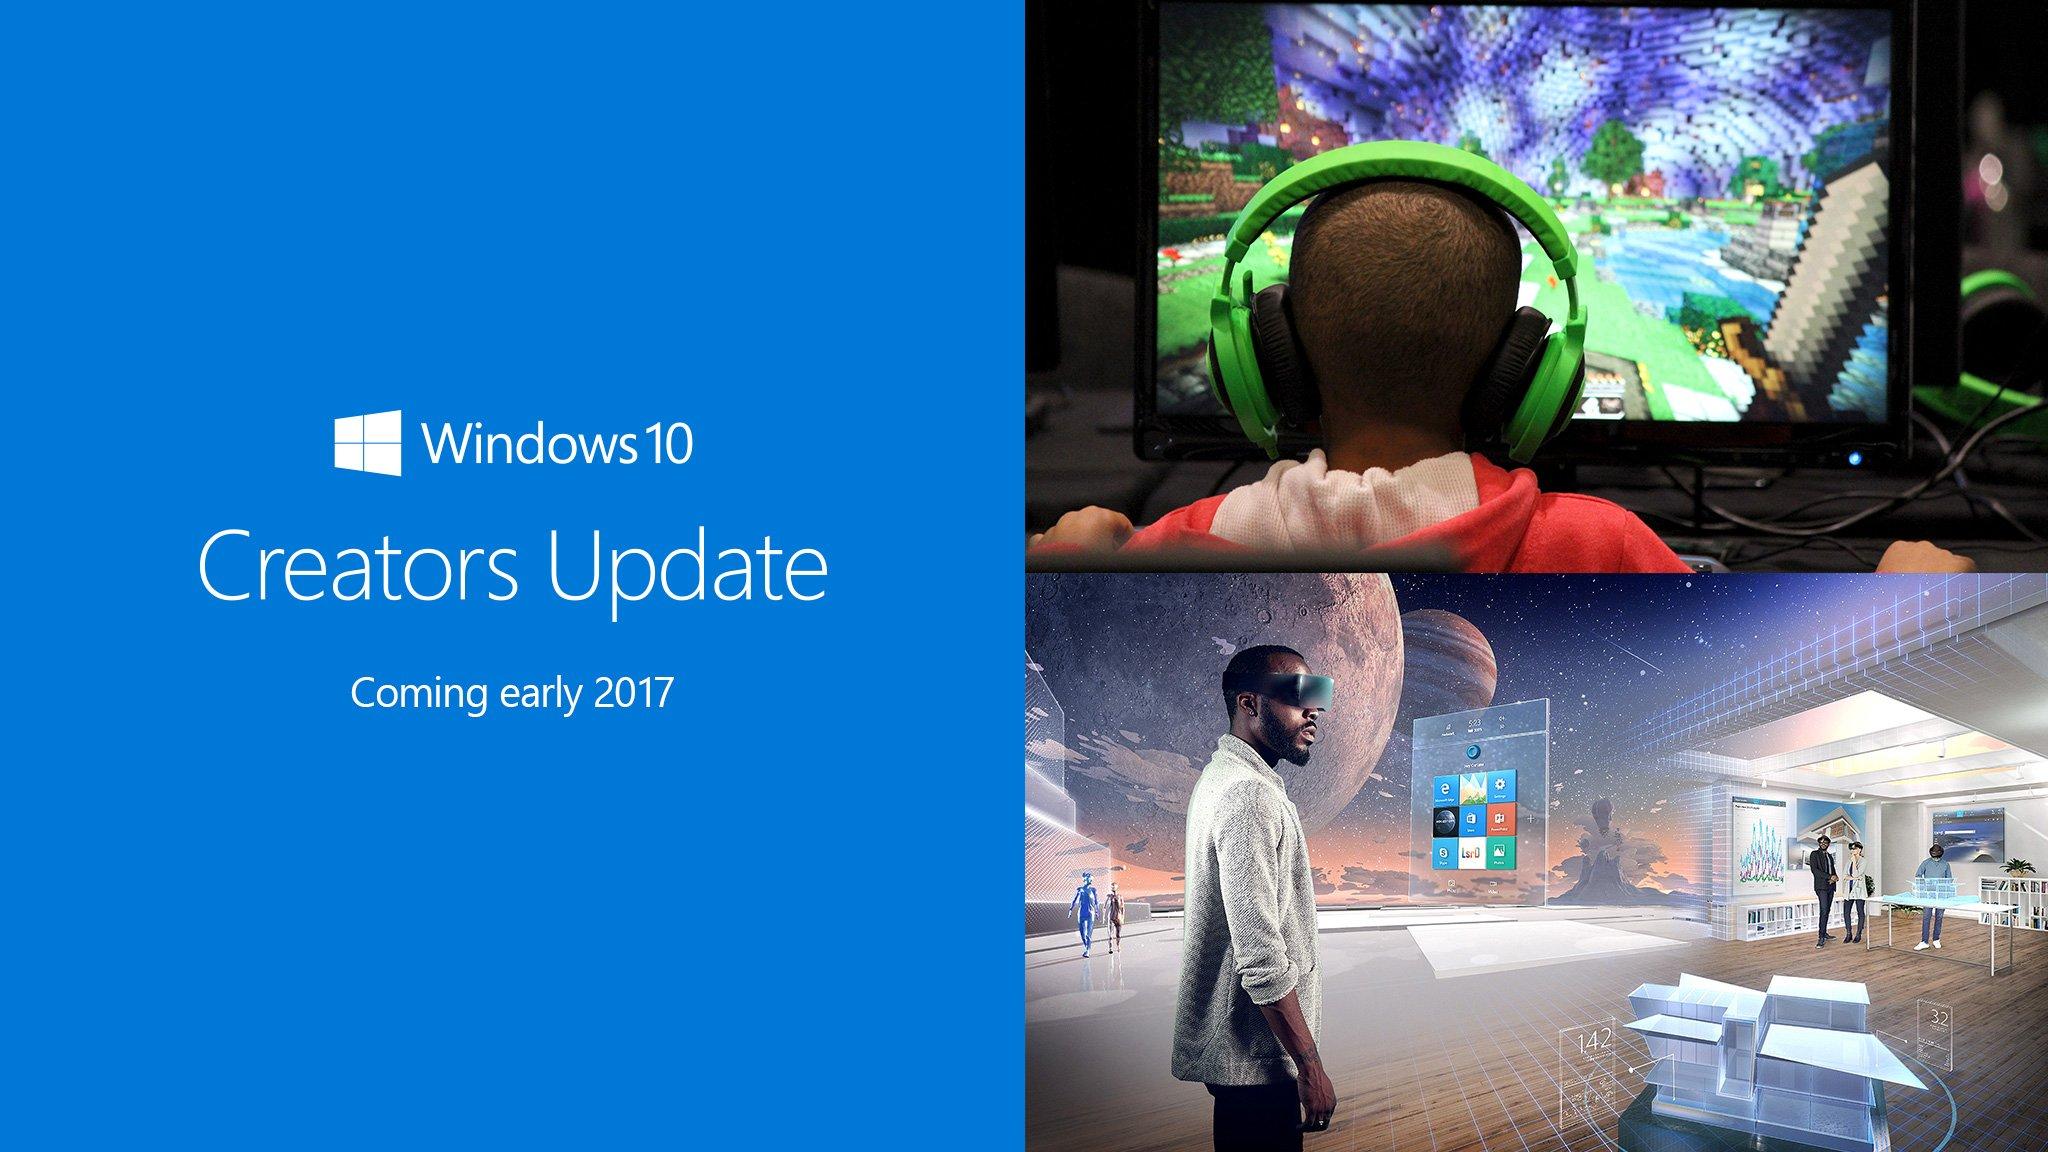 Windows 10 Creators Update Bluetooth Issues